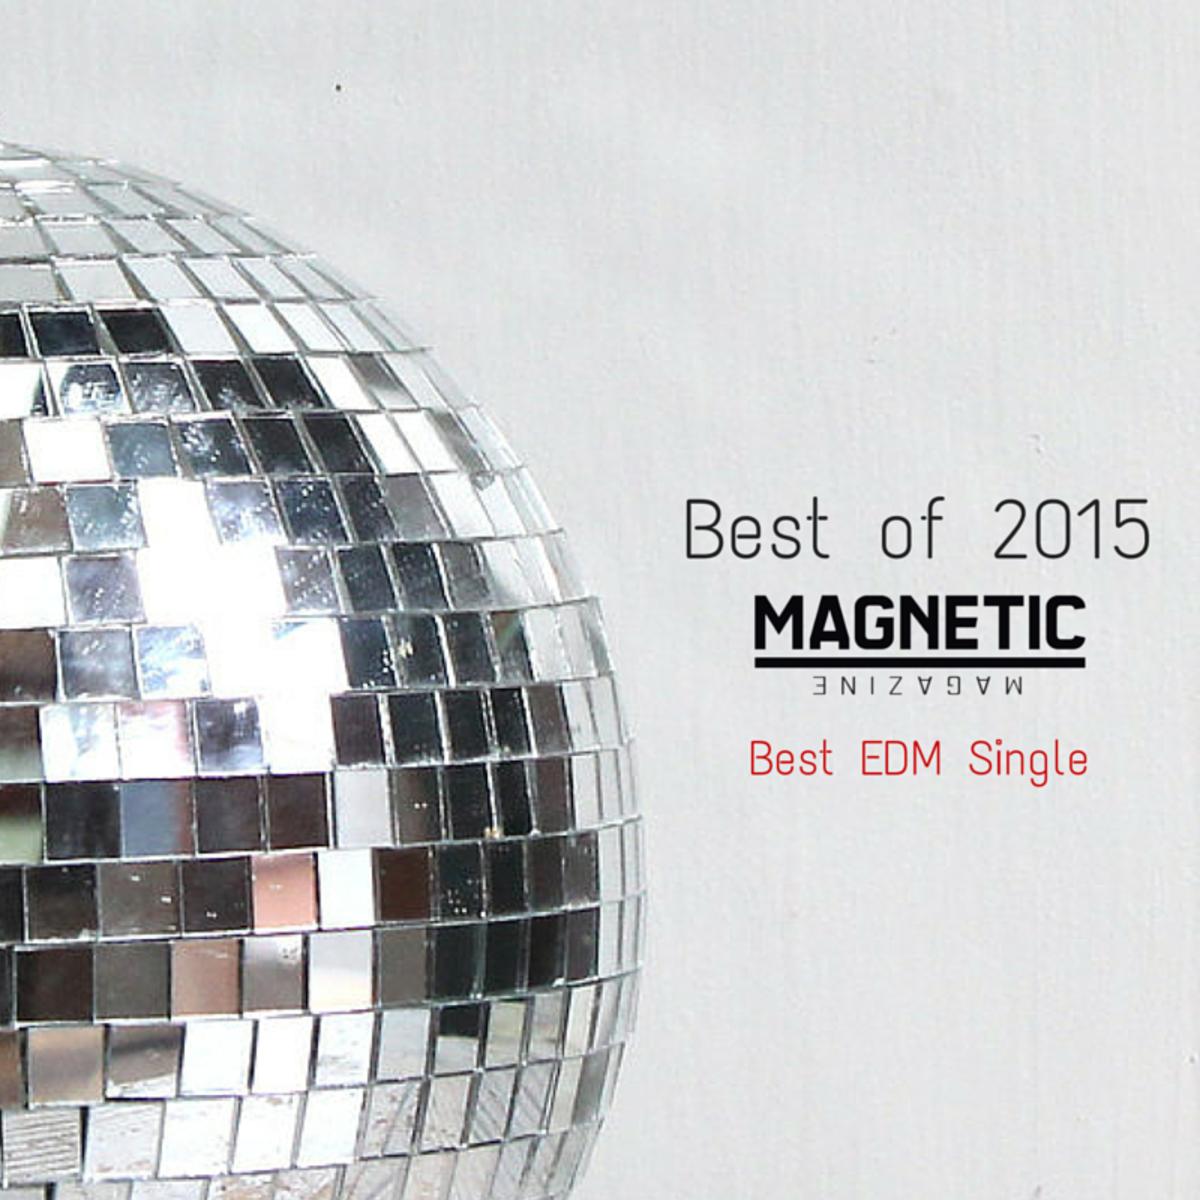 Best EDM Single 2015